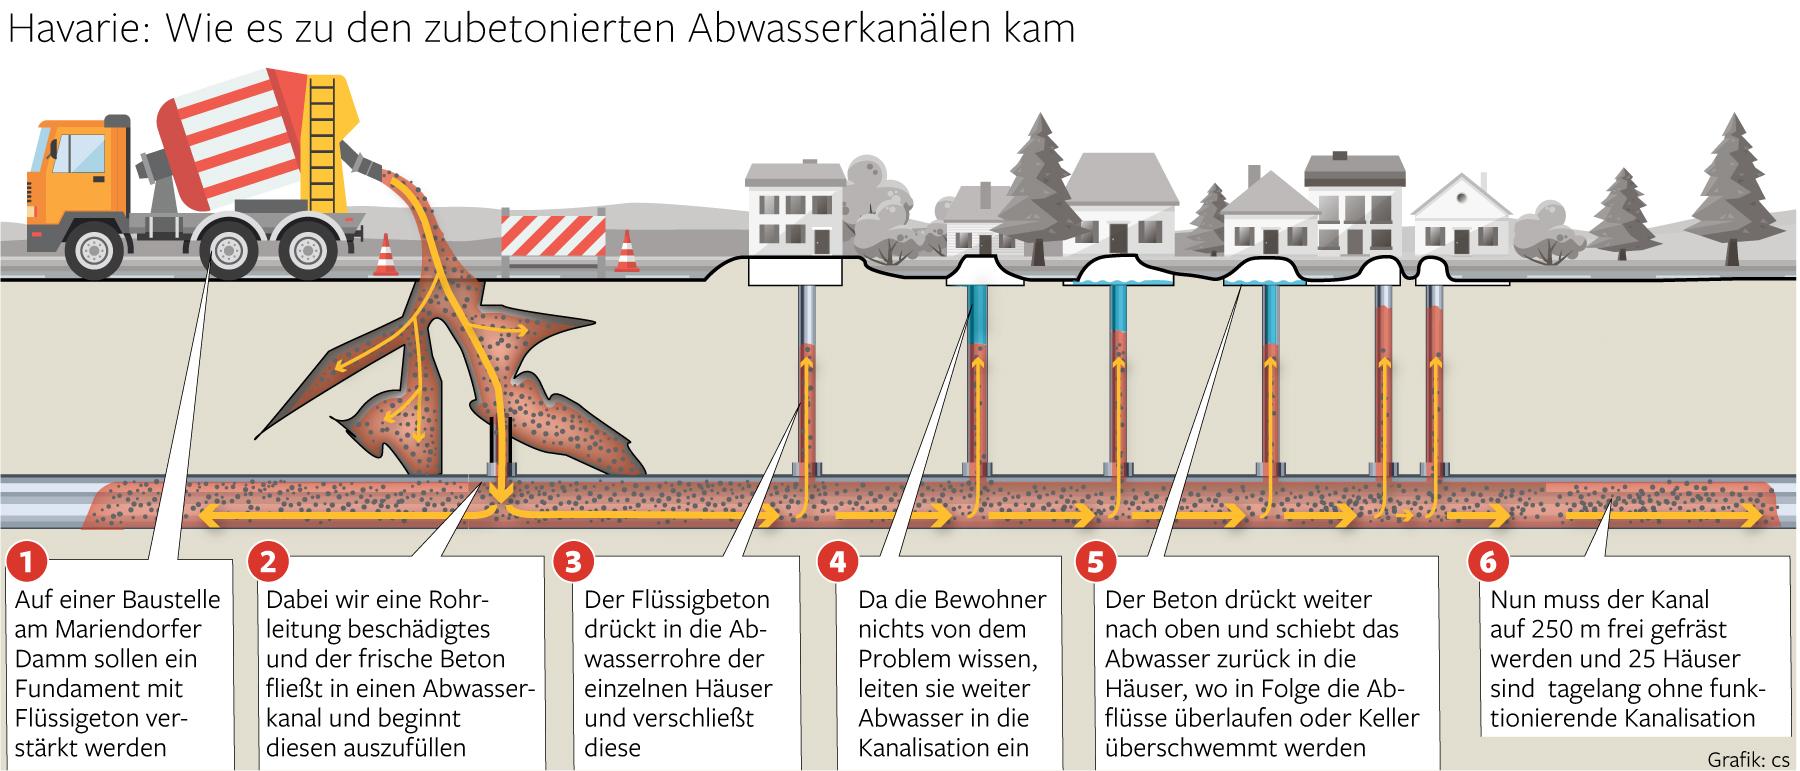 Extrem Wenn Flüssigbeton den Abwasserkanal verstopft - Tempelhof FG53